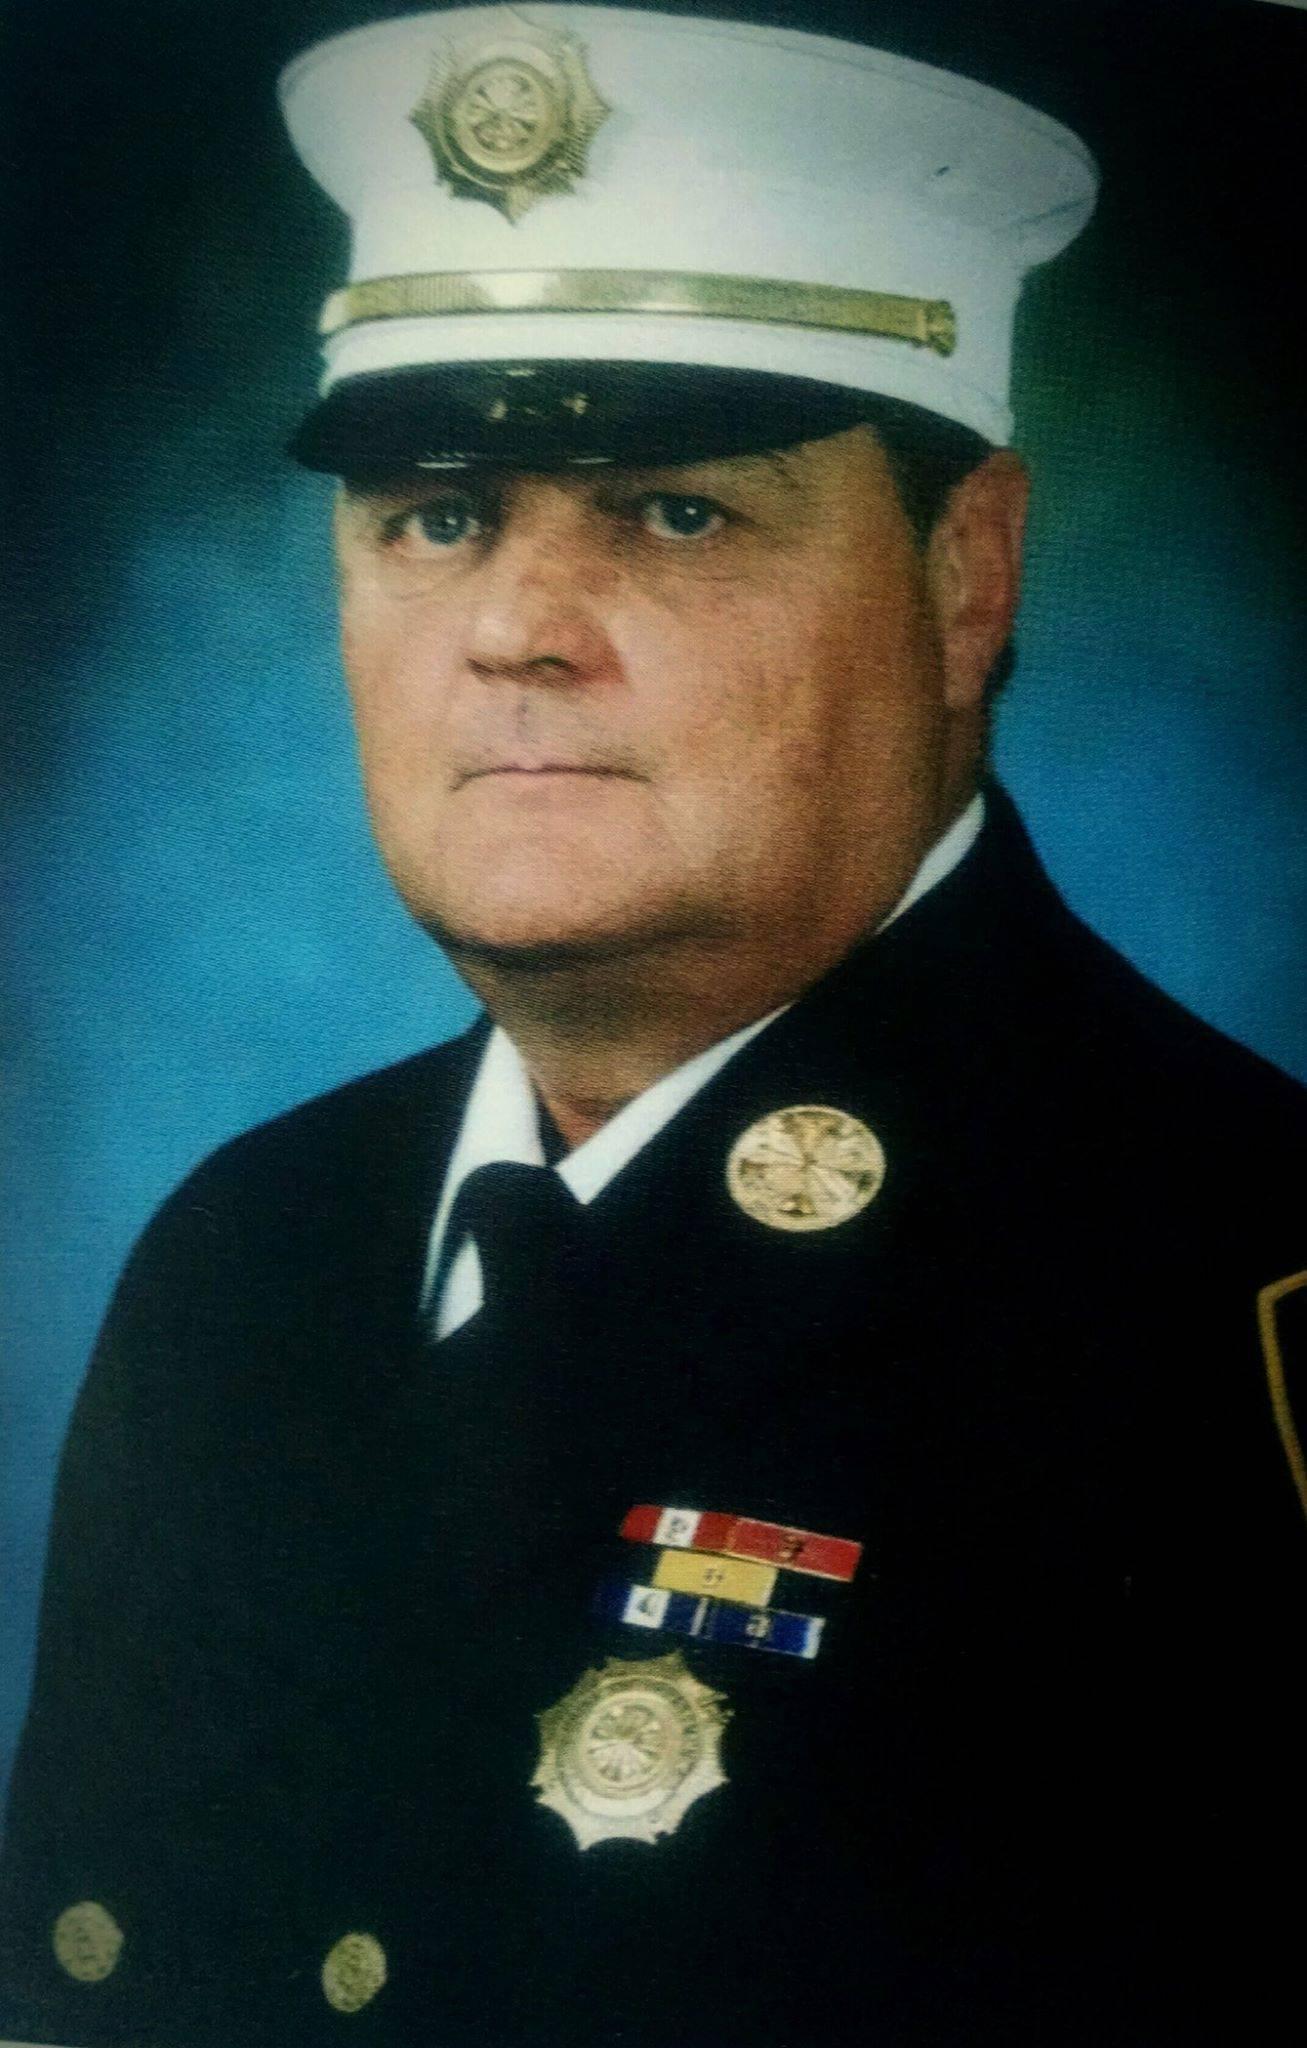 07c6b42d855b7830bfea_Retired_Chief_Louis_Kelly.jpg